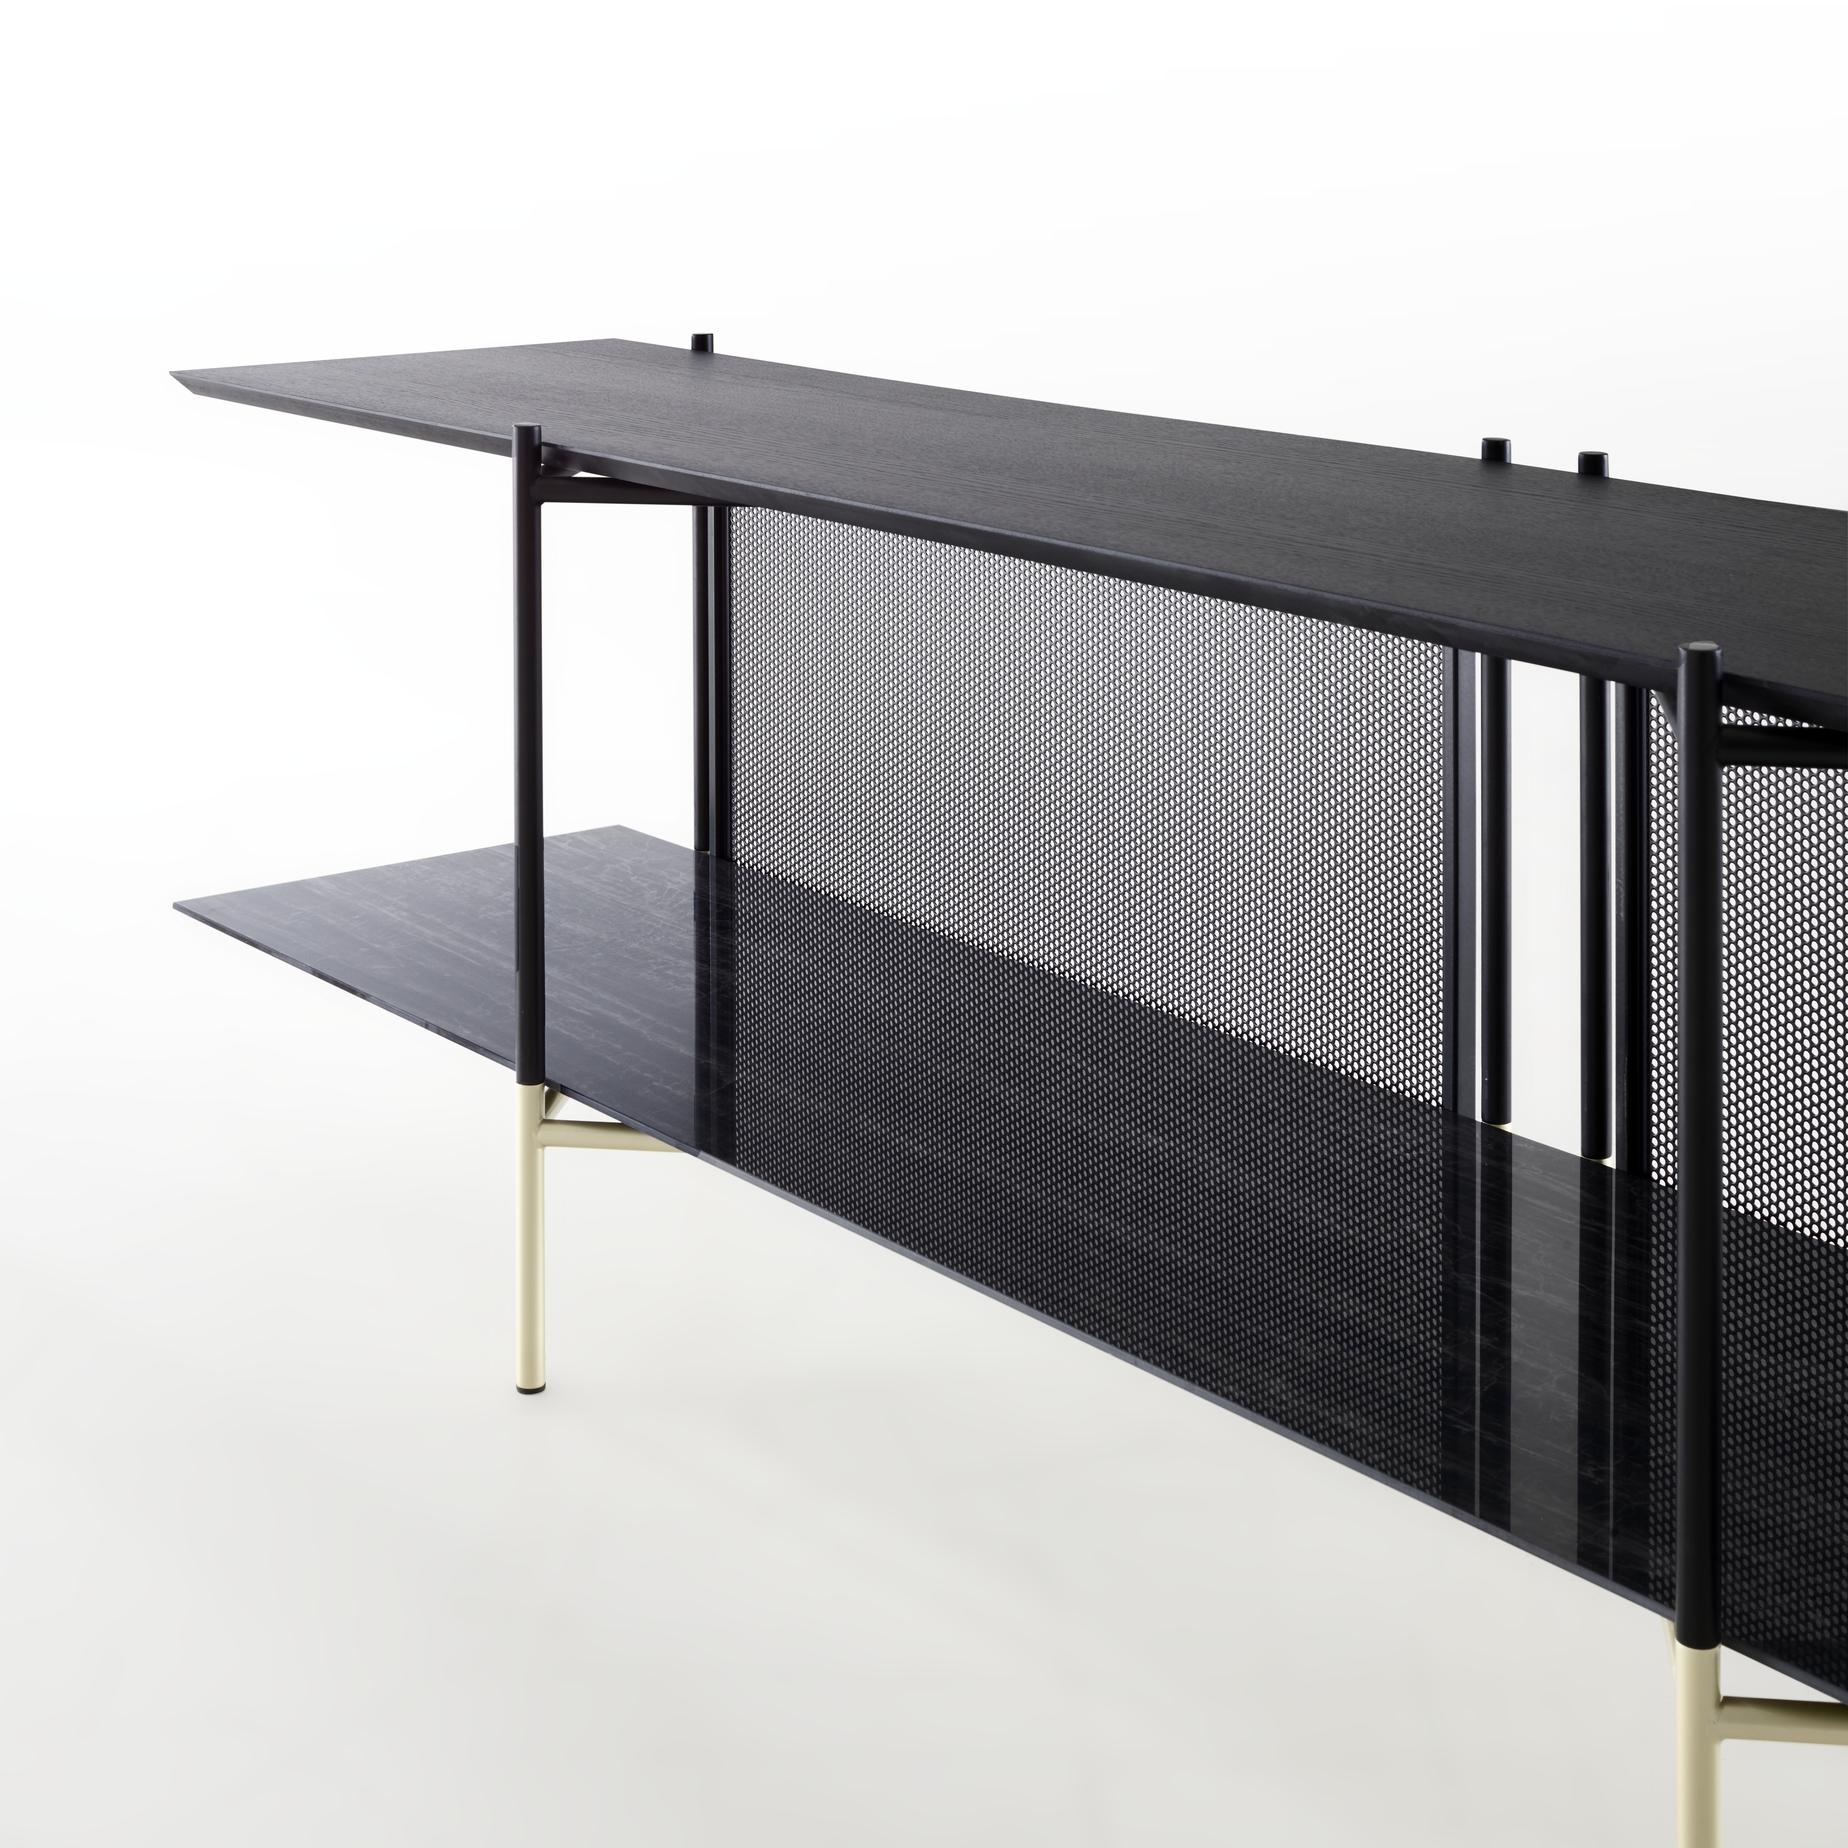 Blennemann Duisburg clyde, media storage from designer : numéro111 | ligne roset